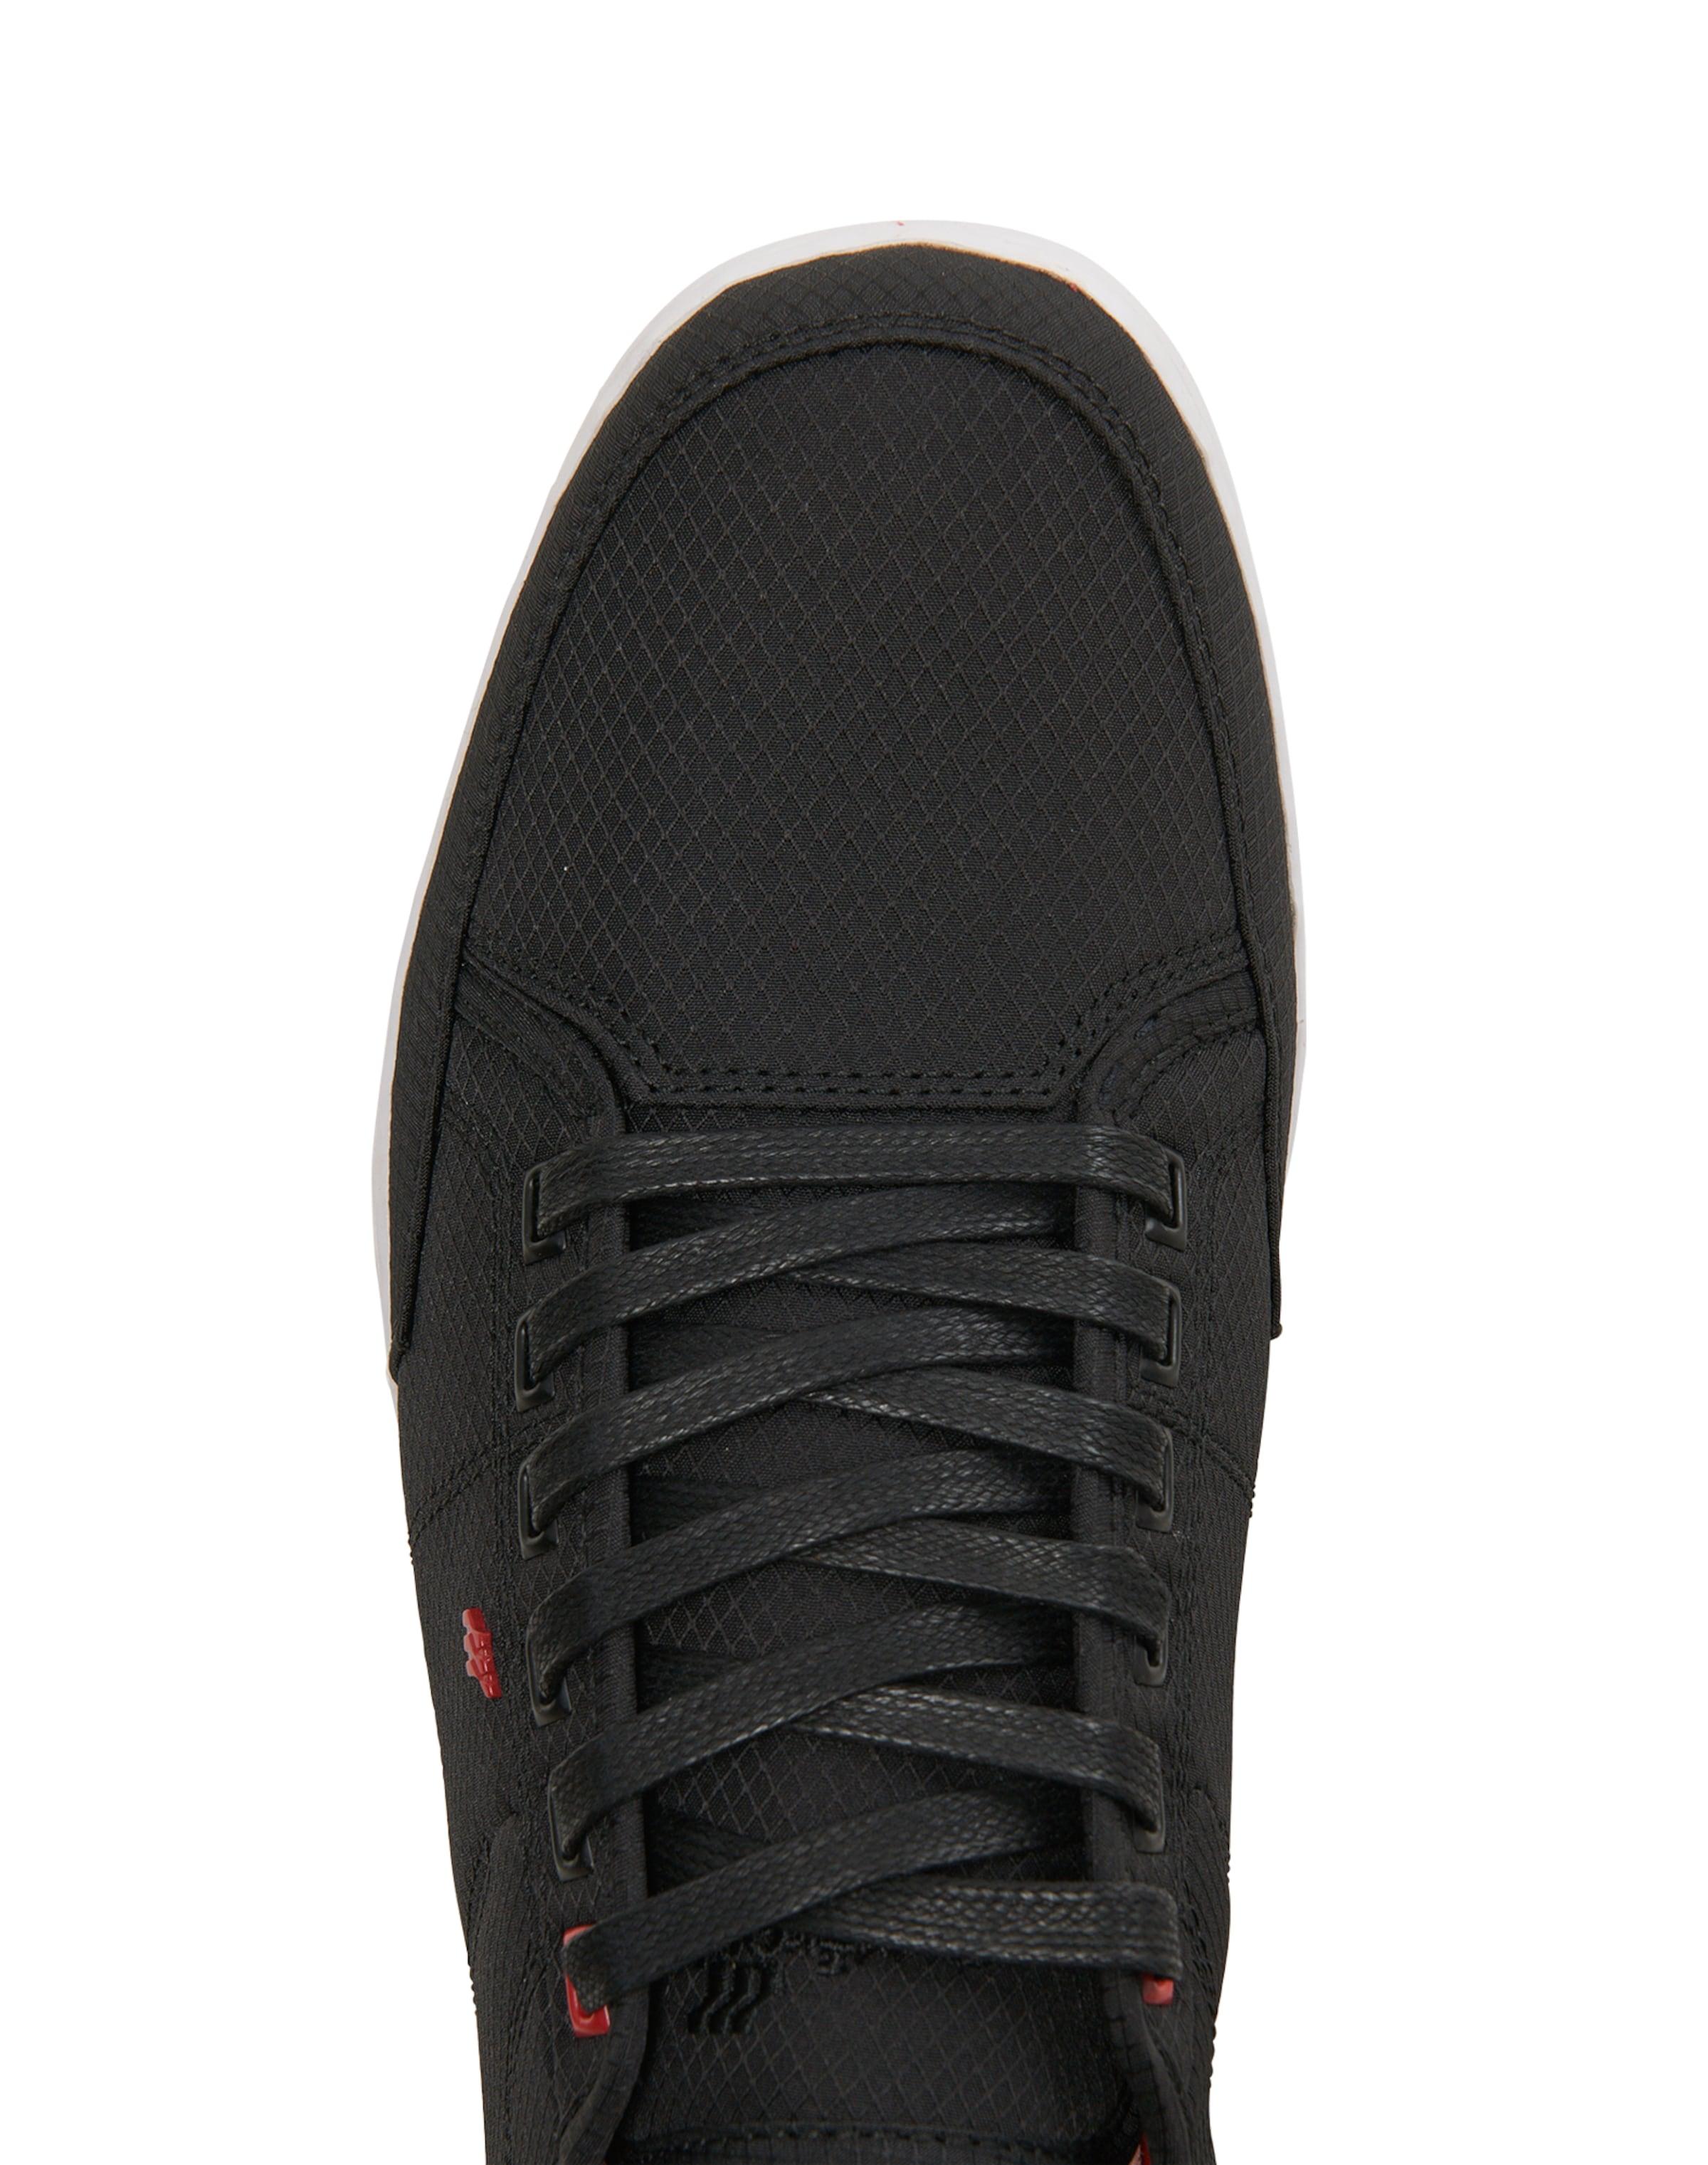 RotSchwarz Sneaker In 'sparko' Boxfresh Weiß 29IeDWHYEb